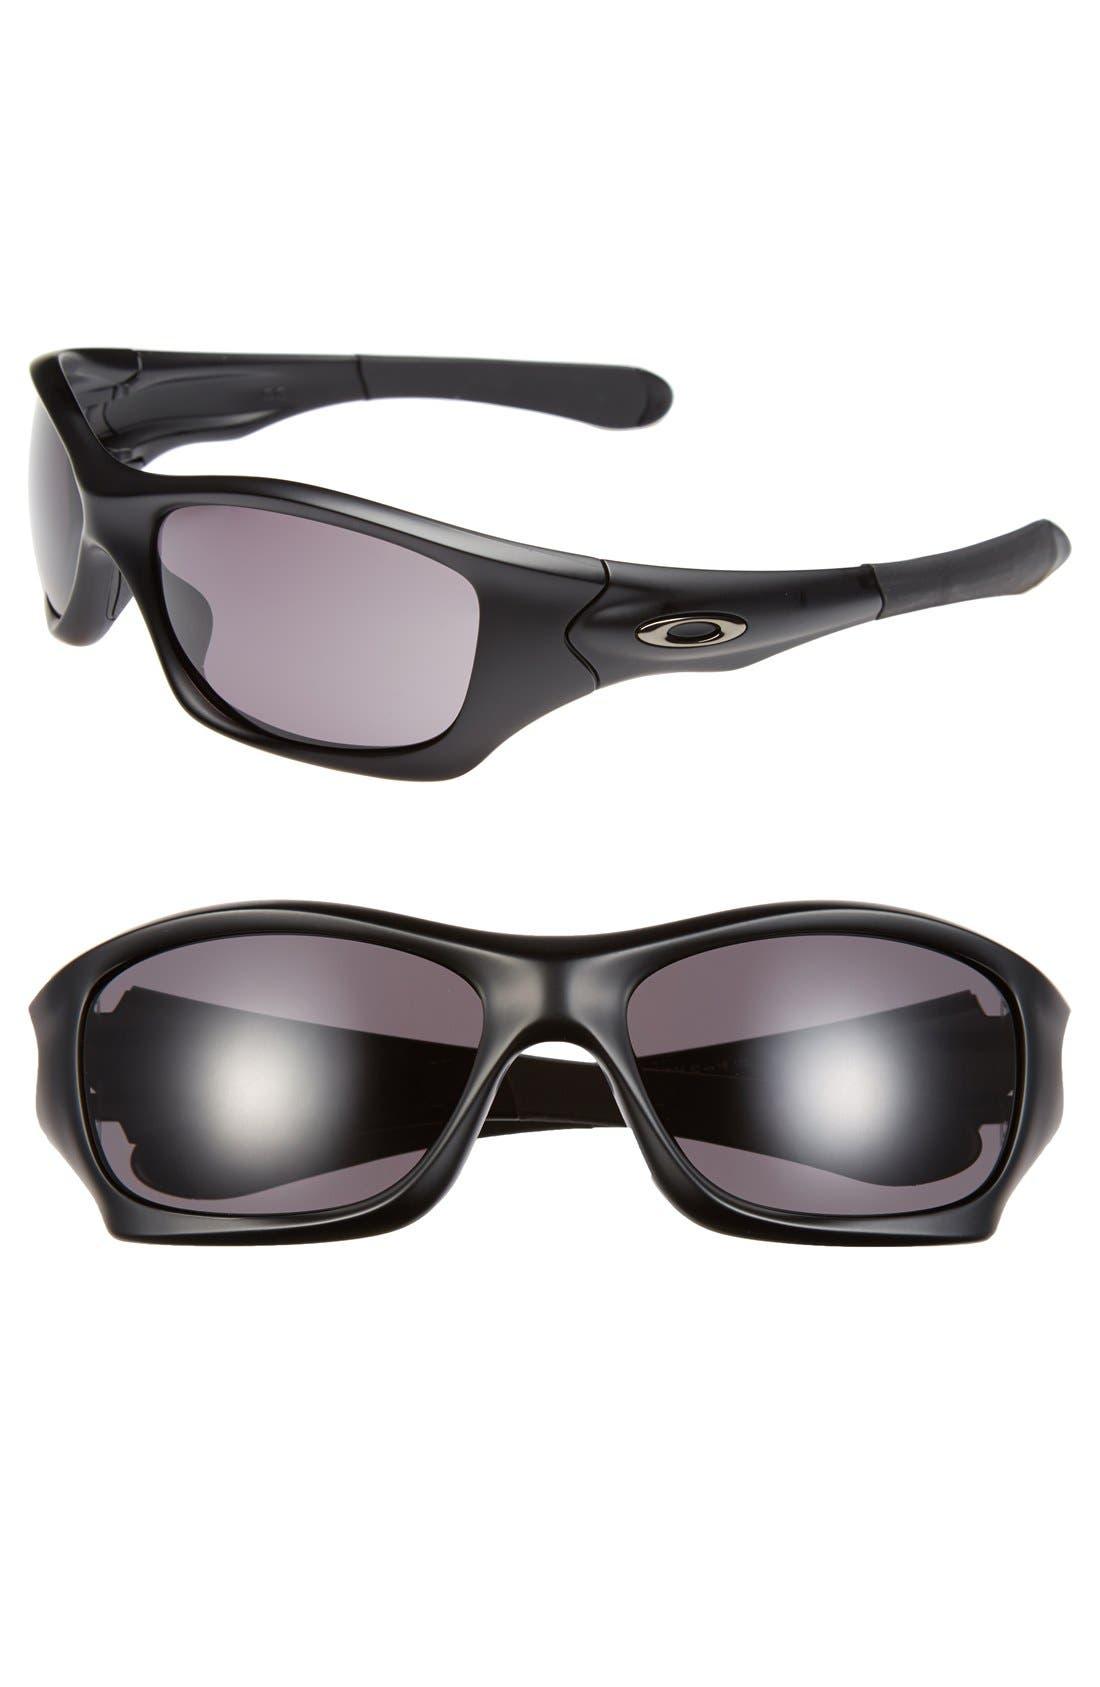 Main Image - Oakley 'Pit Bull' 62mm Sunglasses